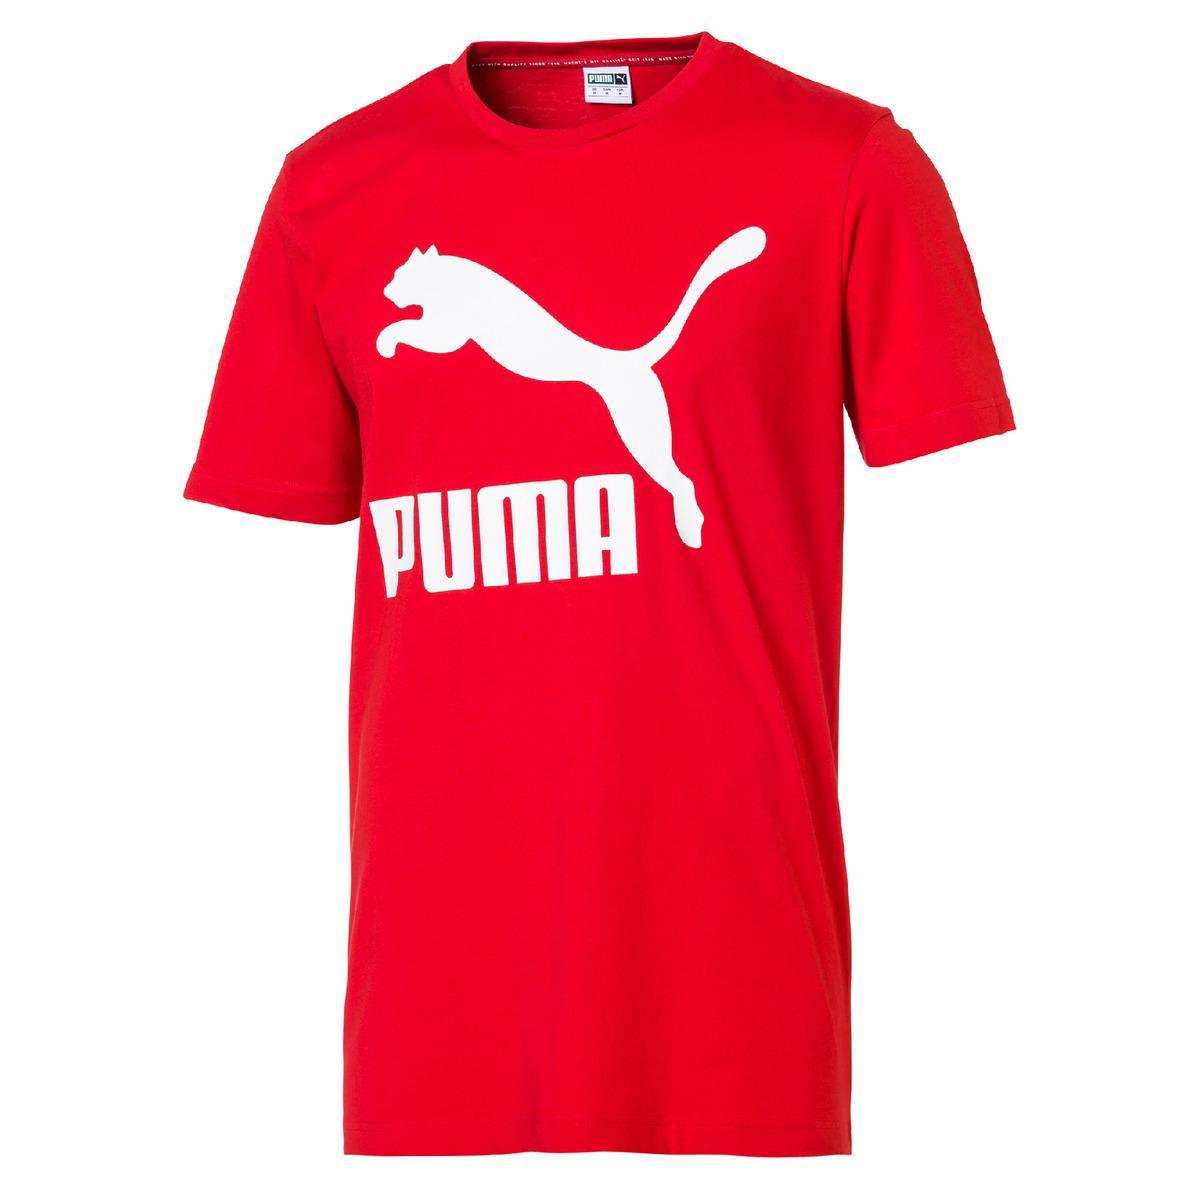 59393610bff PUMA. Men's Red Classic Logo T-shirt. $32 From El Corte Ingles